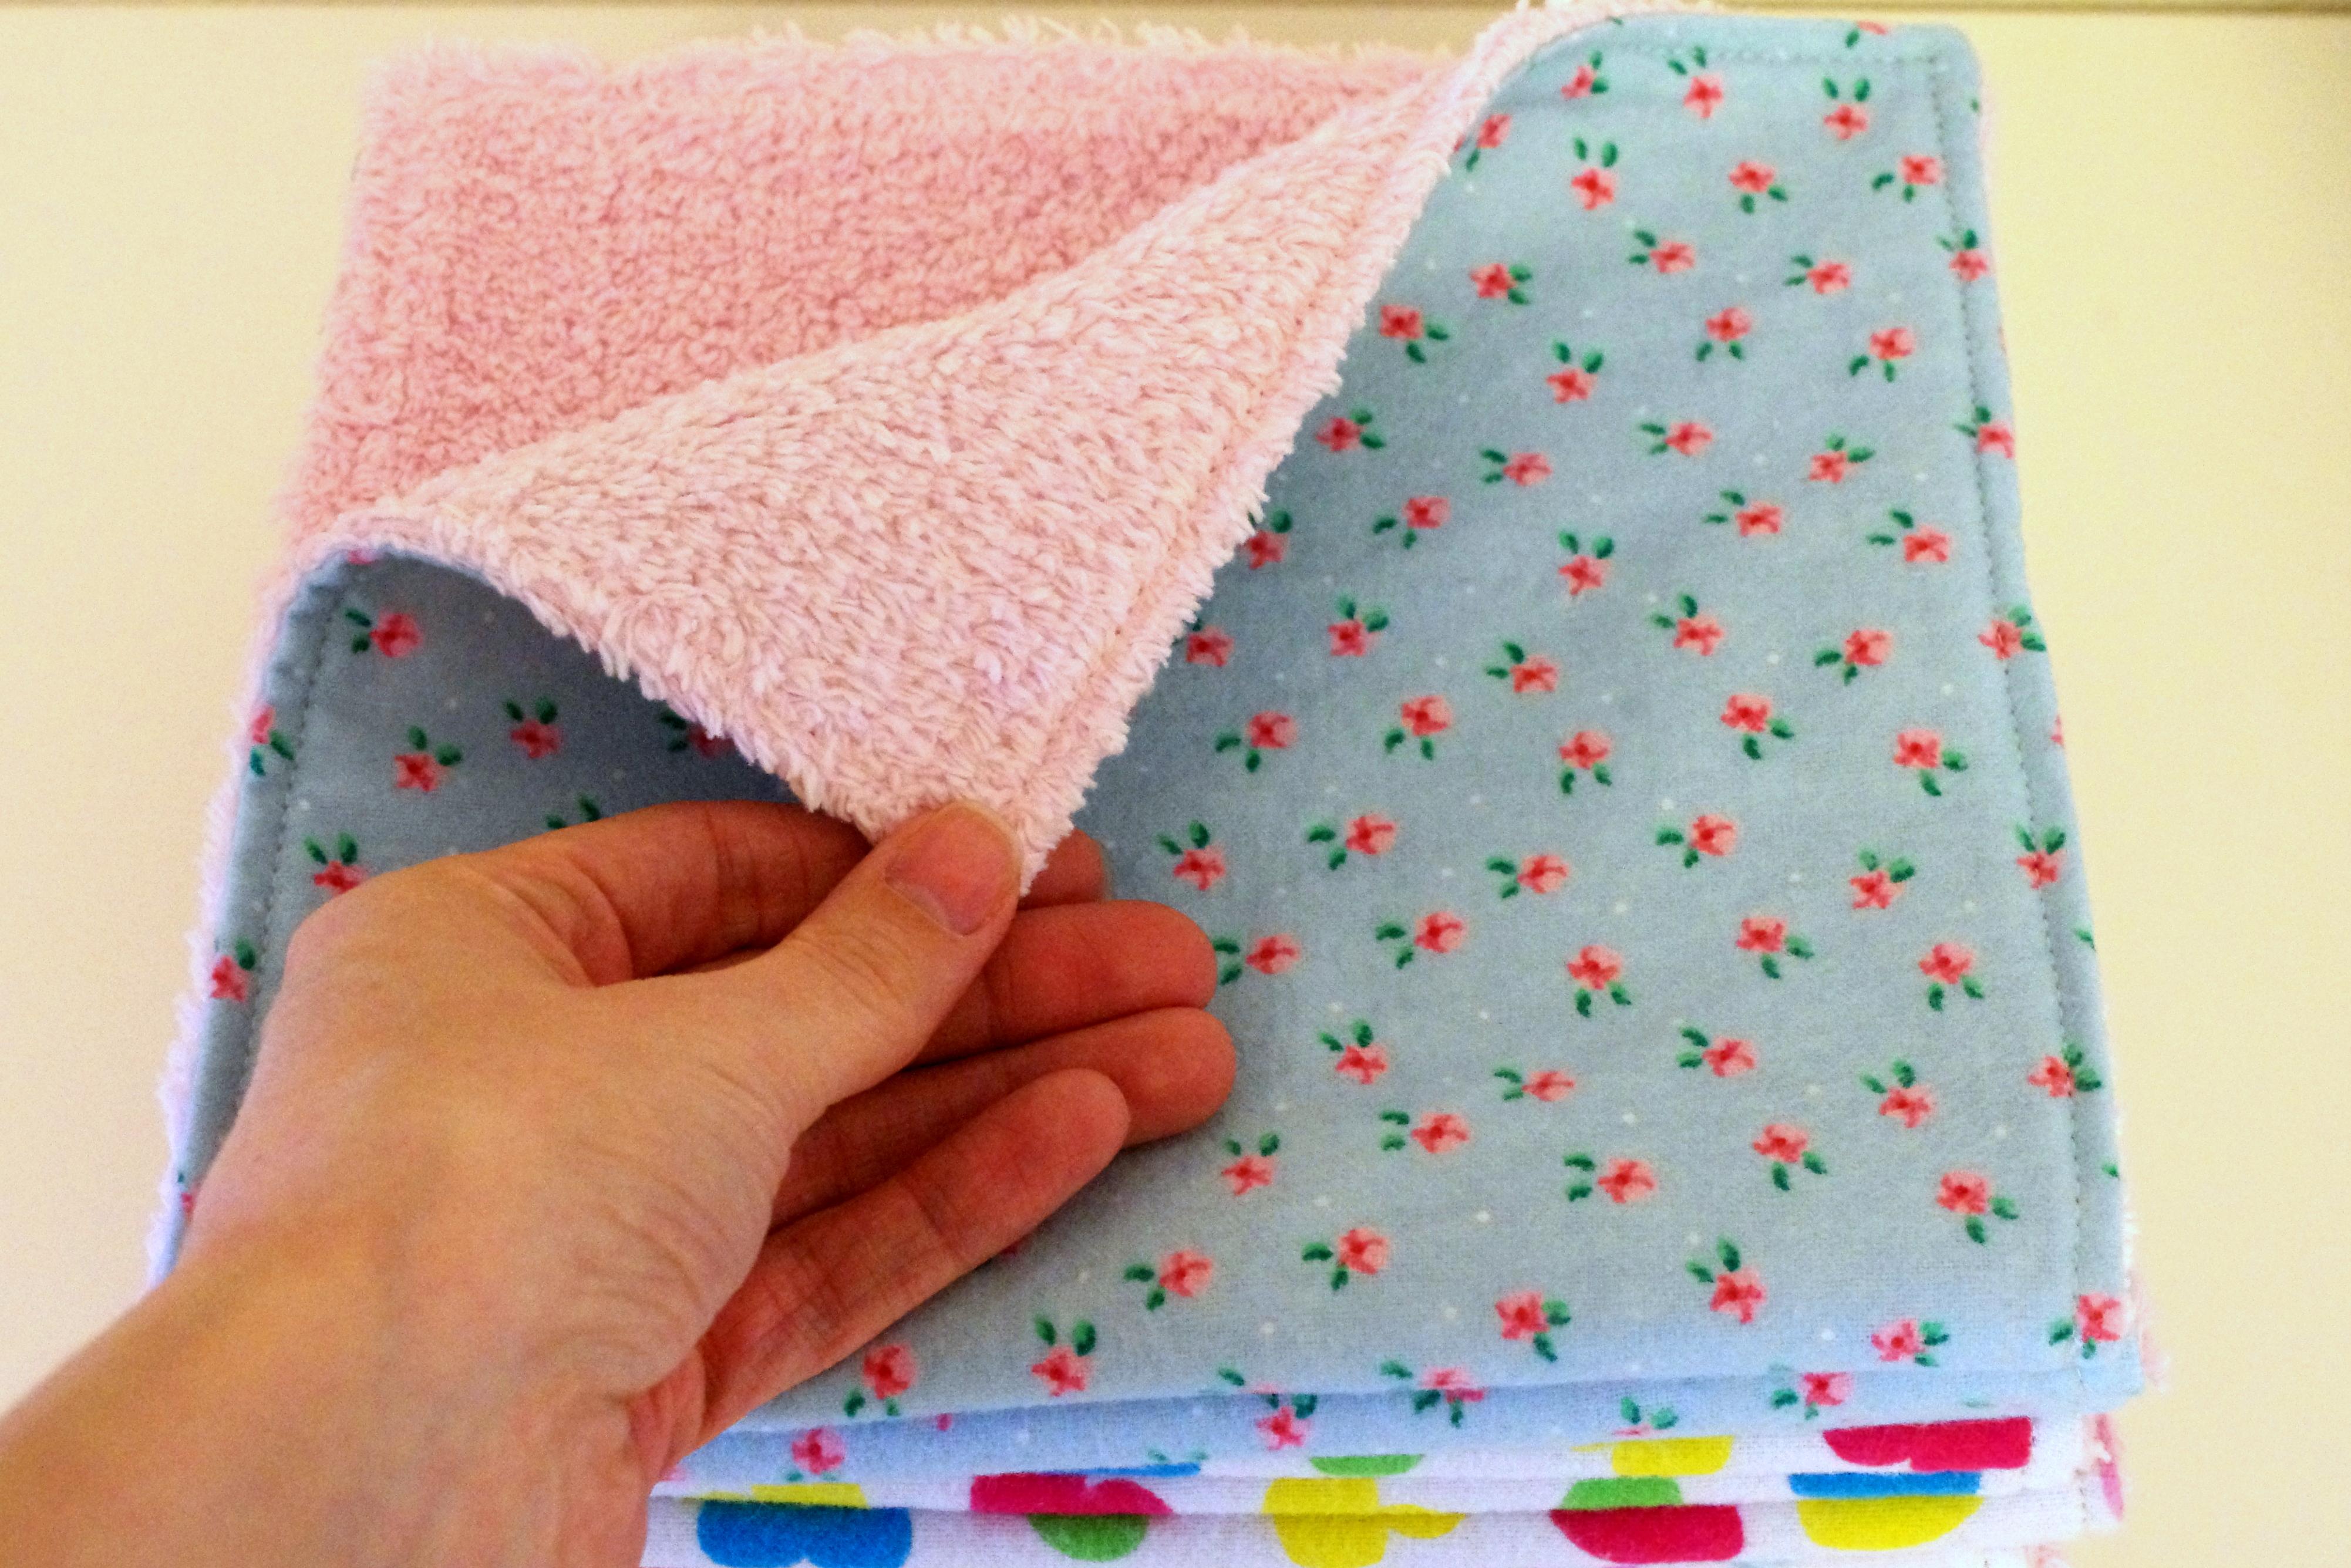 My happy nursery archives cloud9 fabrics.